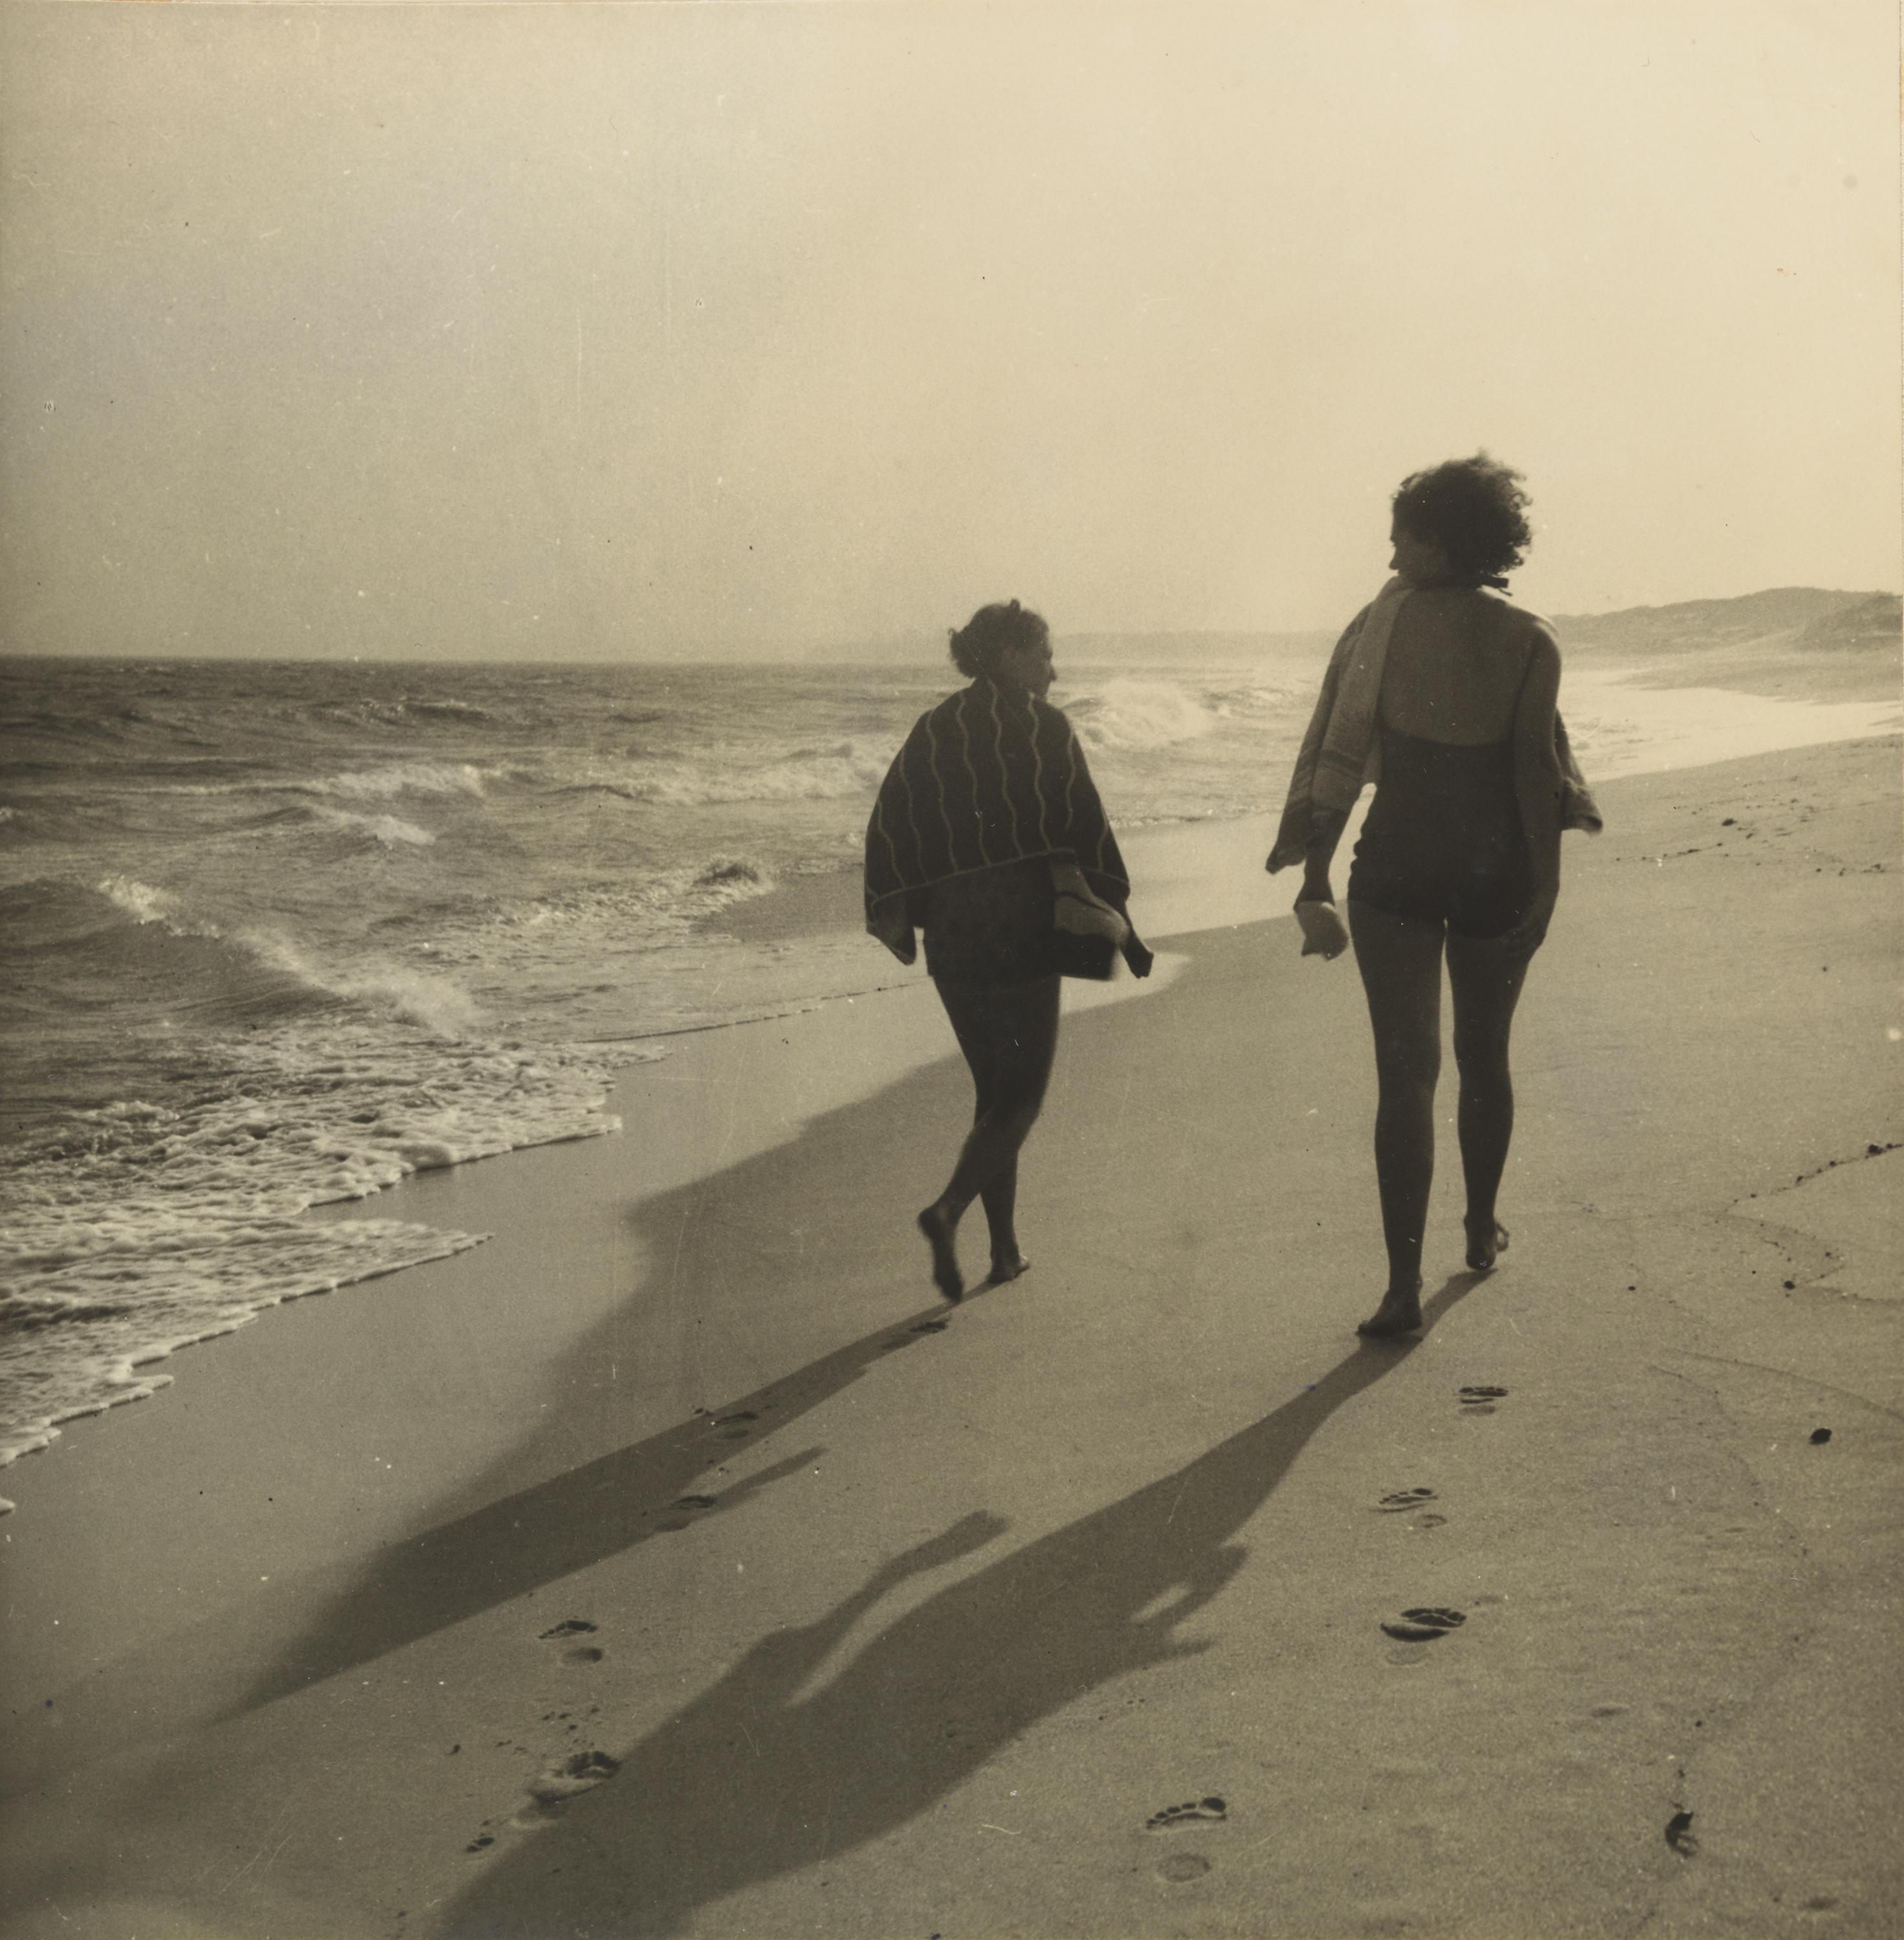 A sepia photograph of two women walking along the shoreline of a beach.